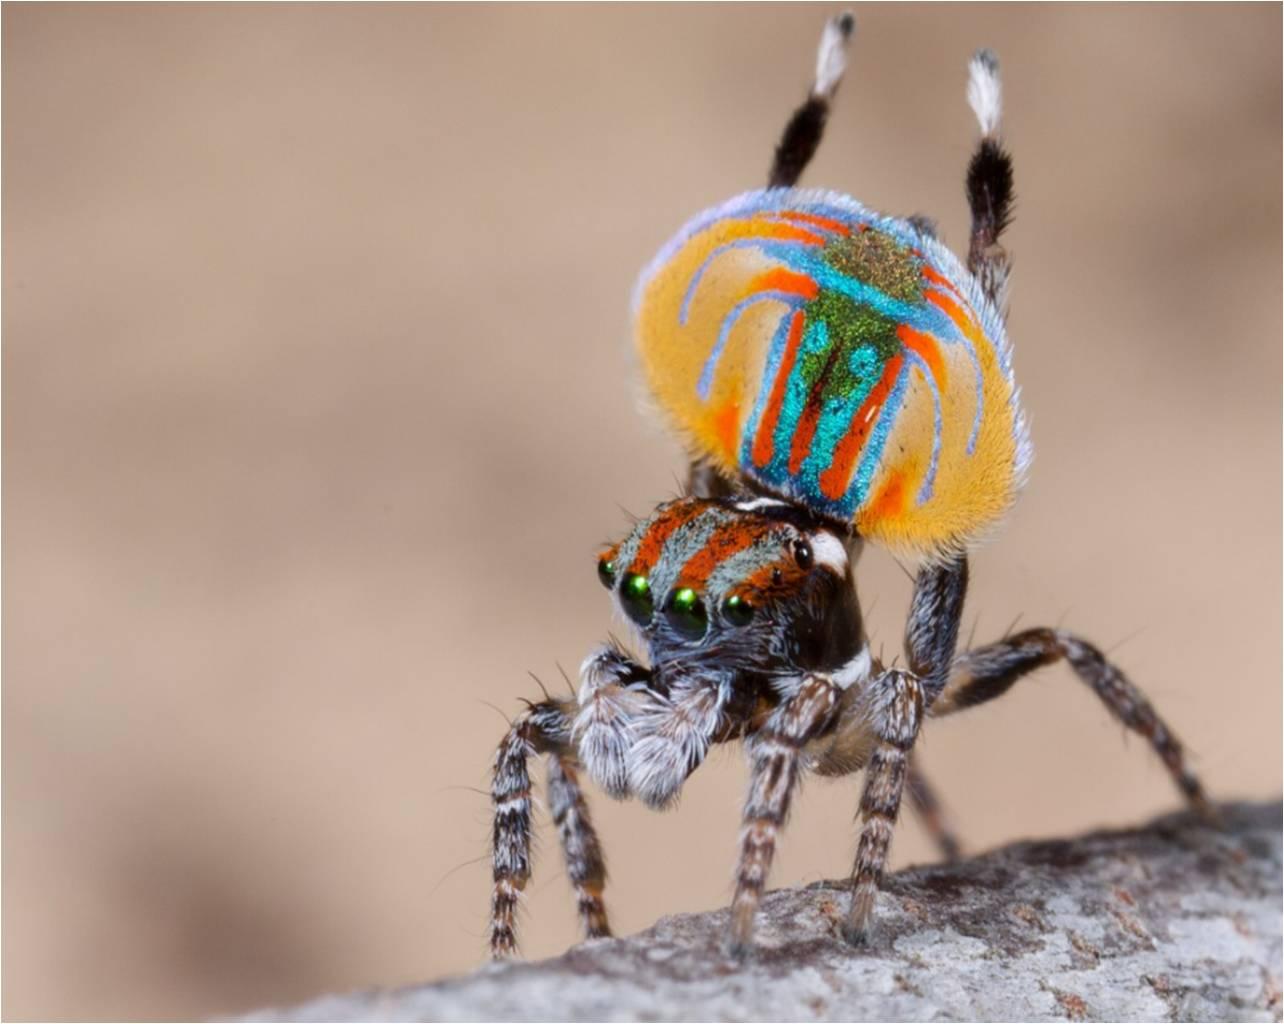 Peacock spider dance - photo#22